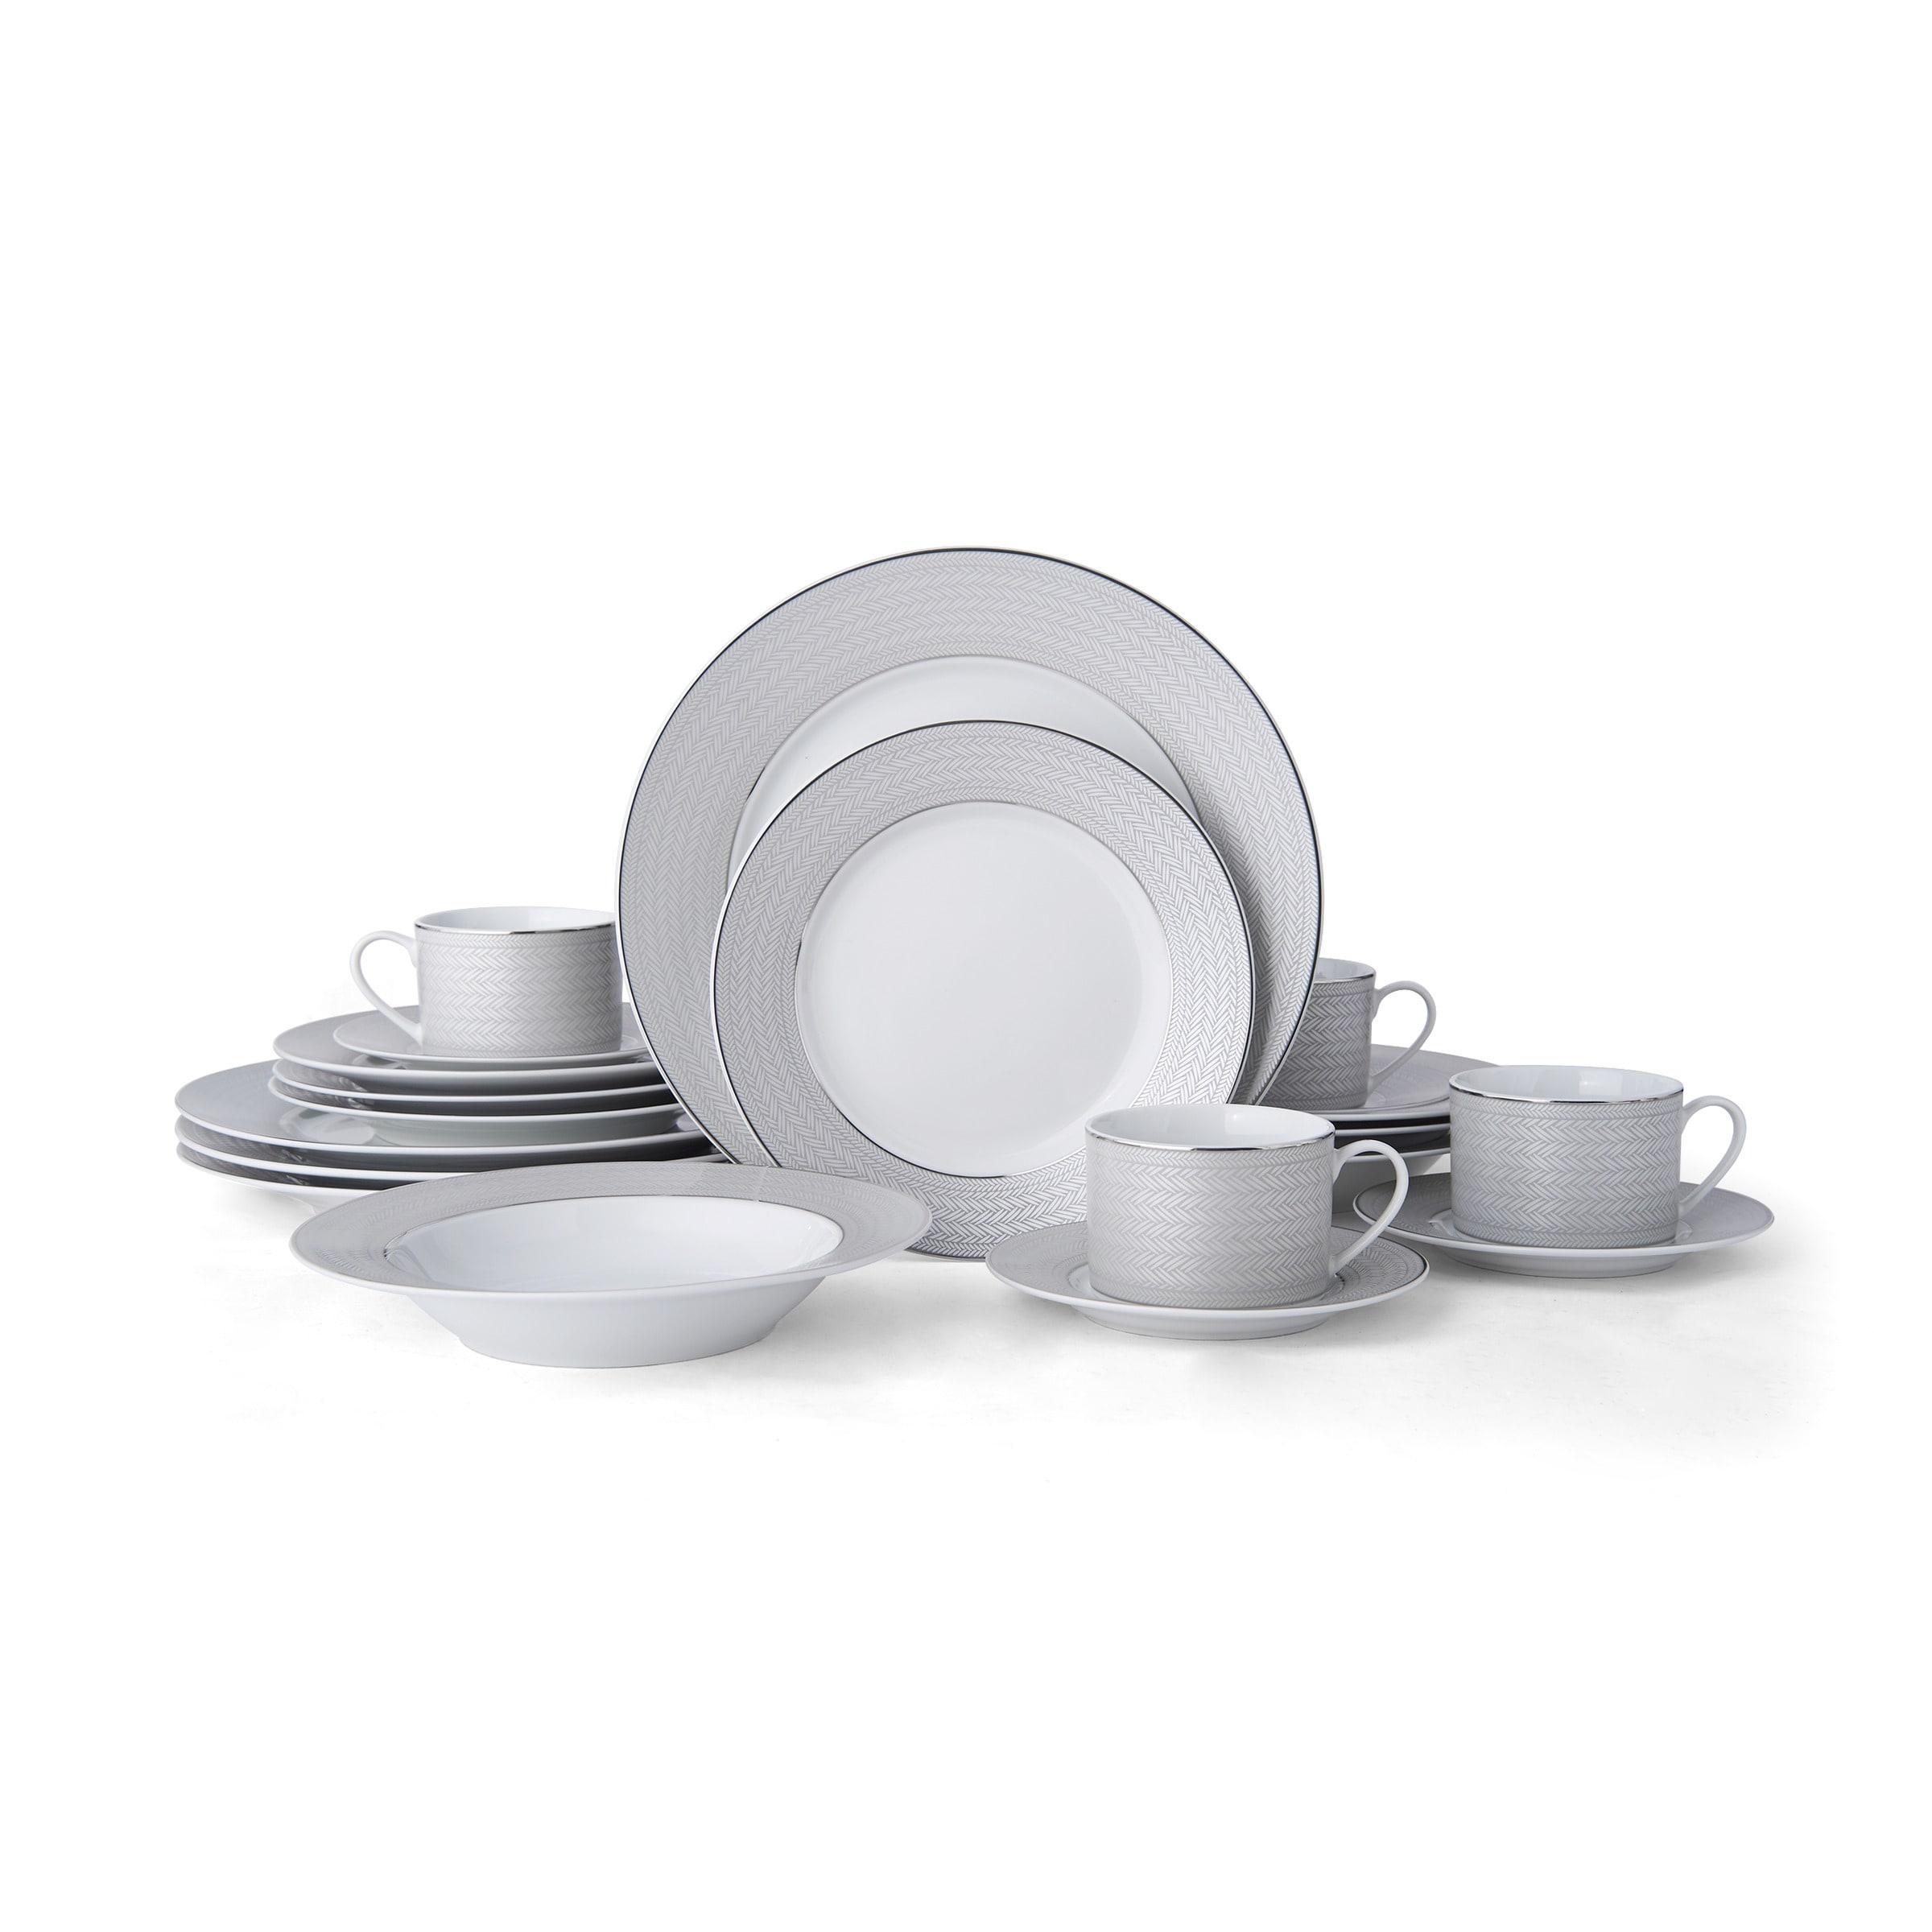 Mikasa Percy Grey 20 Piece Dinnerware Set Service For 4 Overstock 21131348